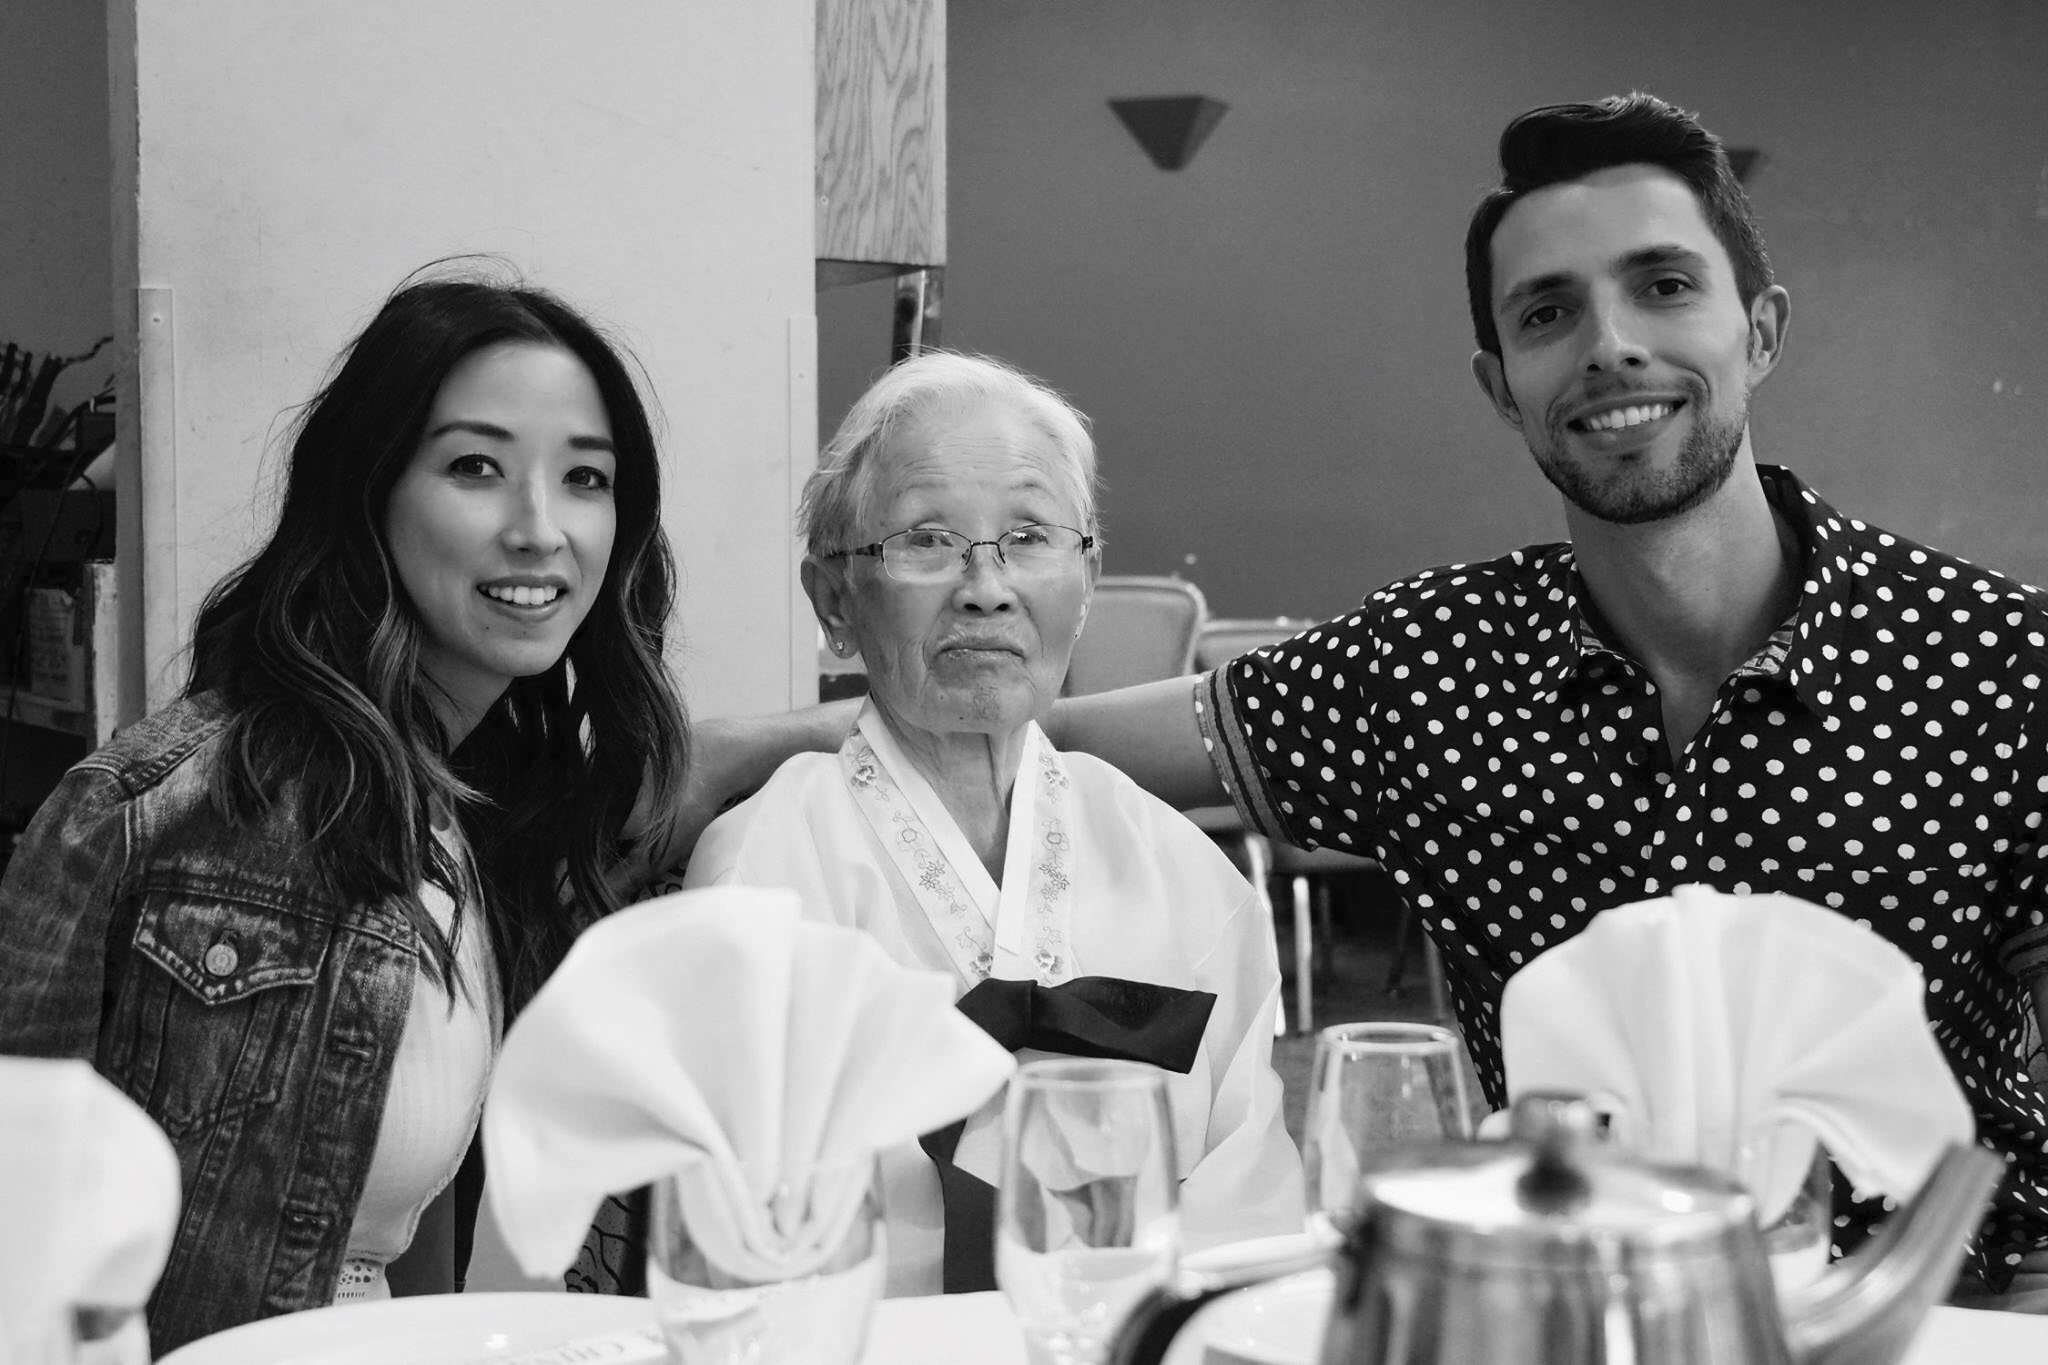 gma's 80th birthday